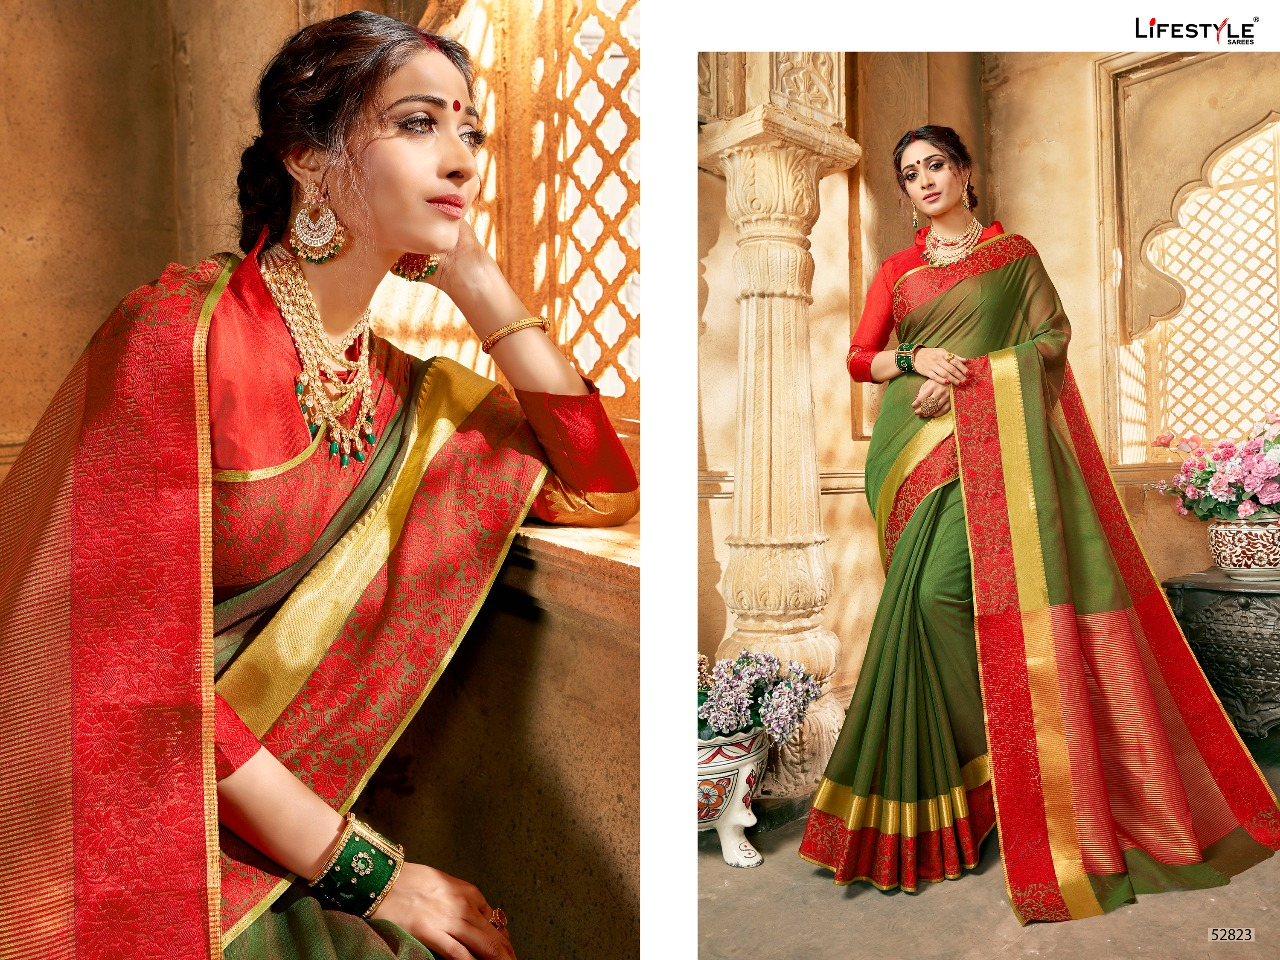 Lifestyle Khadi silk vol 16 52823